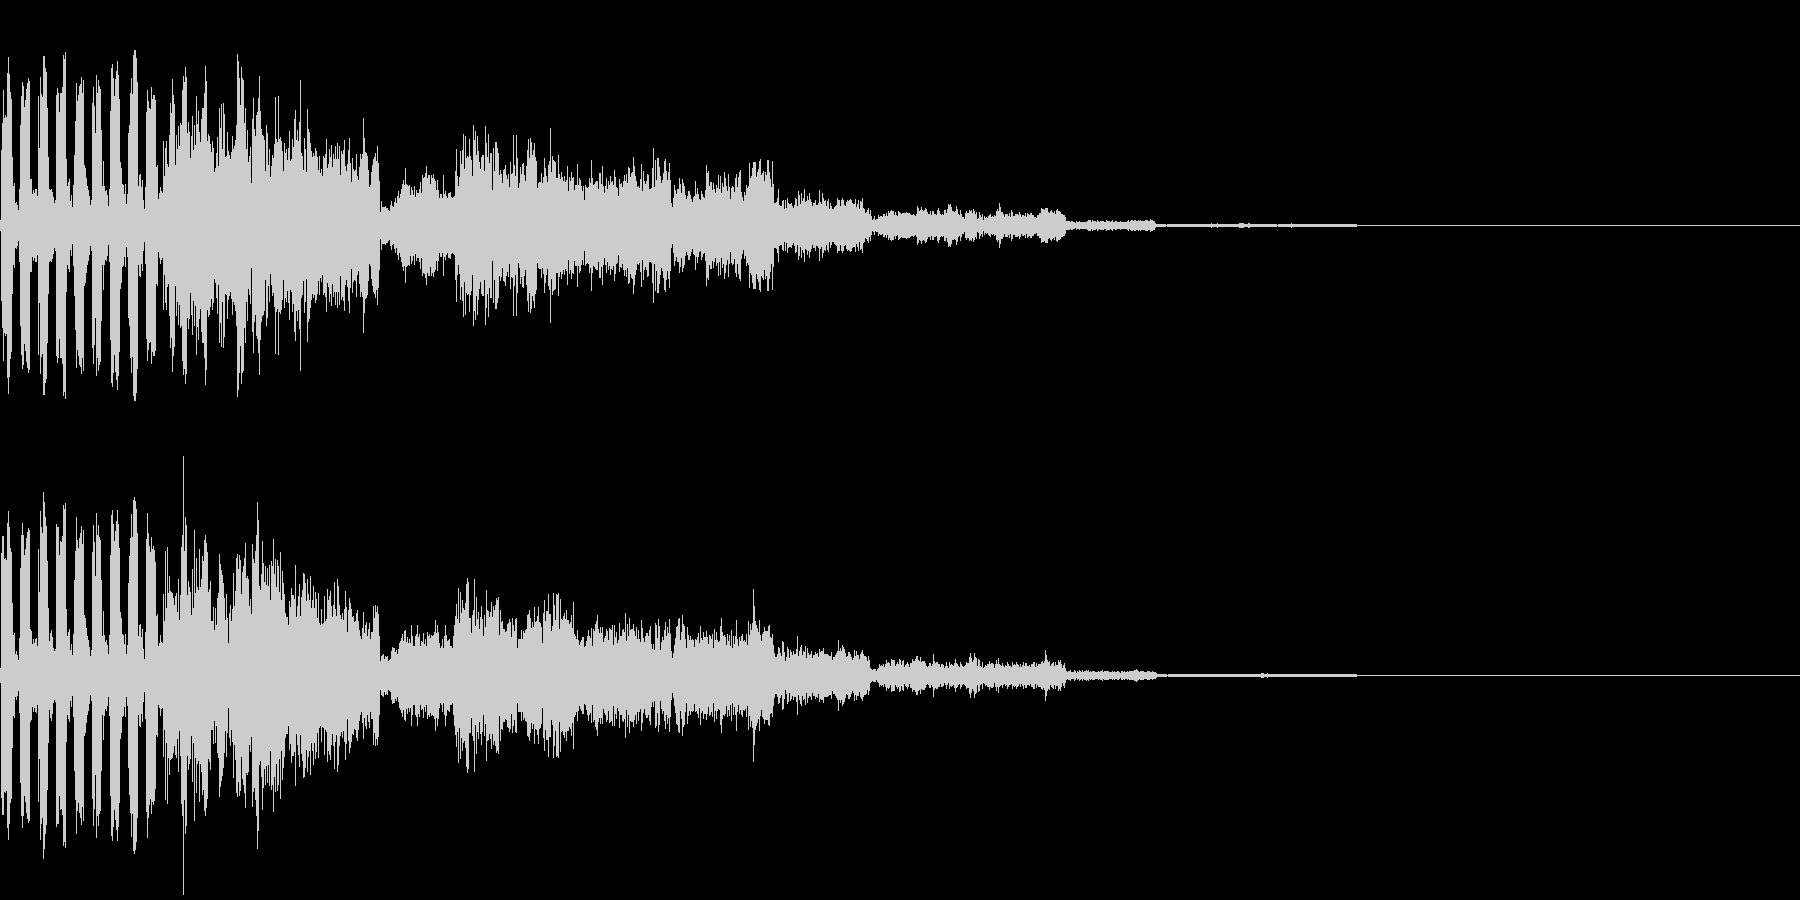 239 FX緊急事態音の未再生の波形